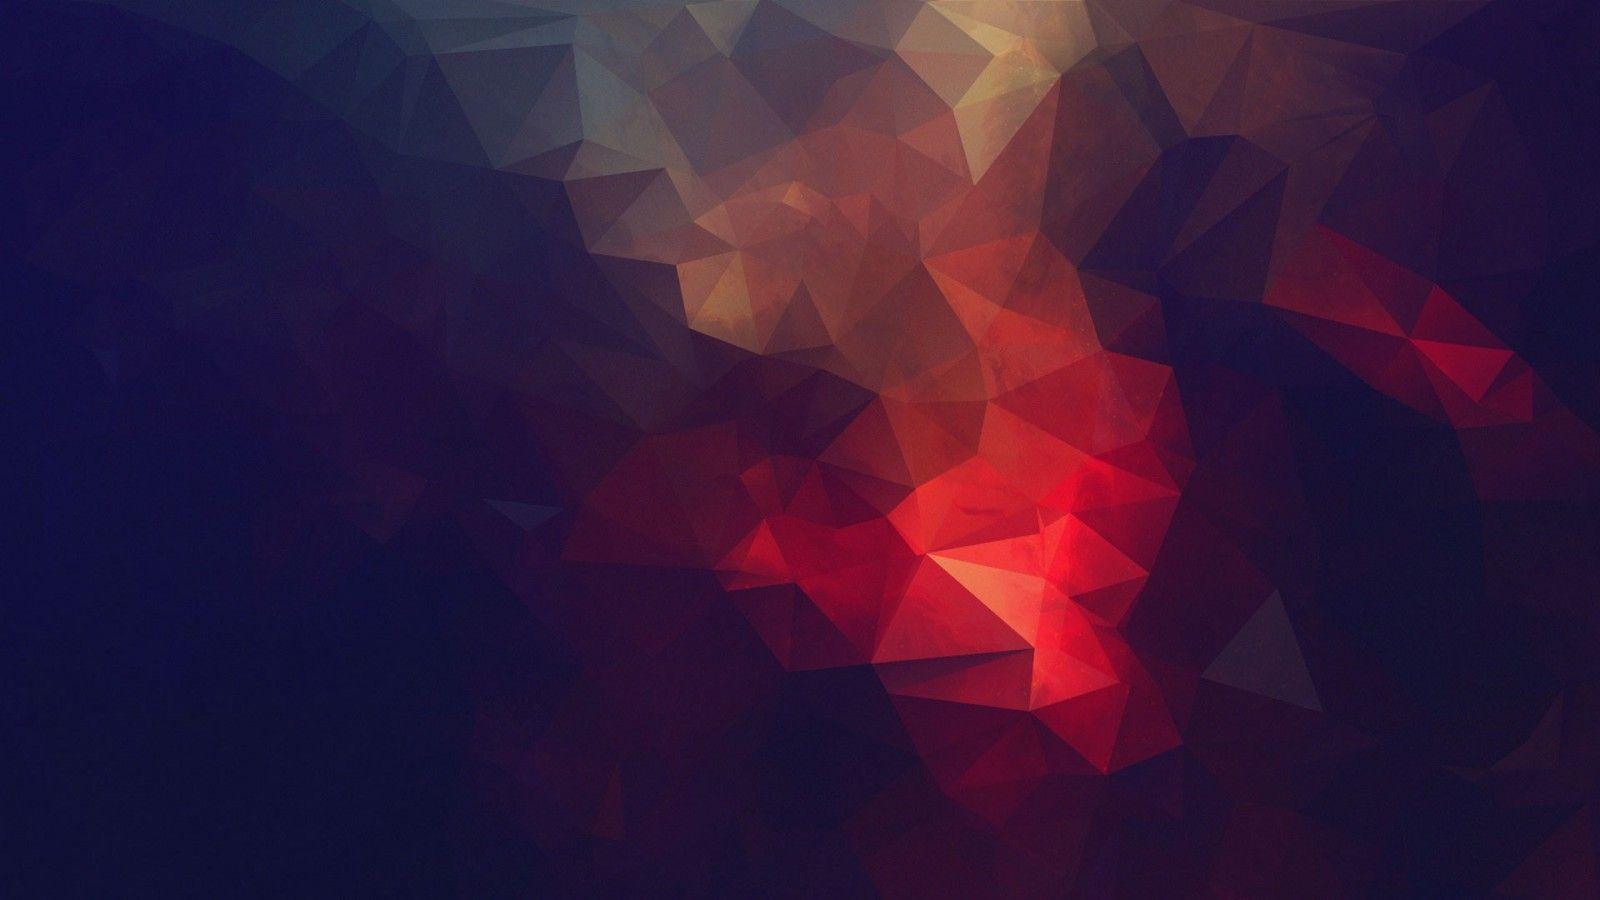 Pin By Haru On Low Poly Sci Fi Digital Wallpaper Geometric Artwork Polygon Art